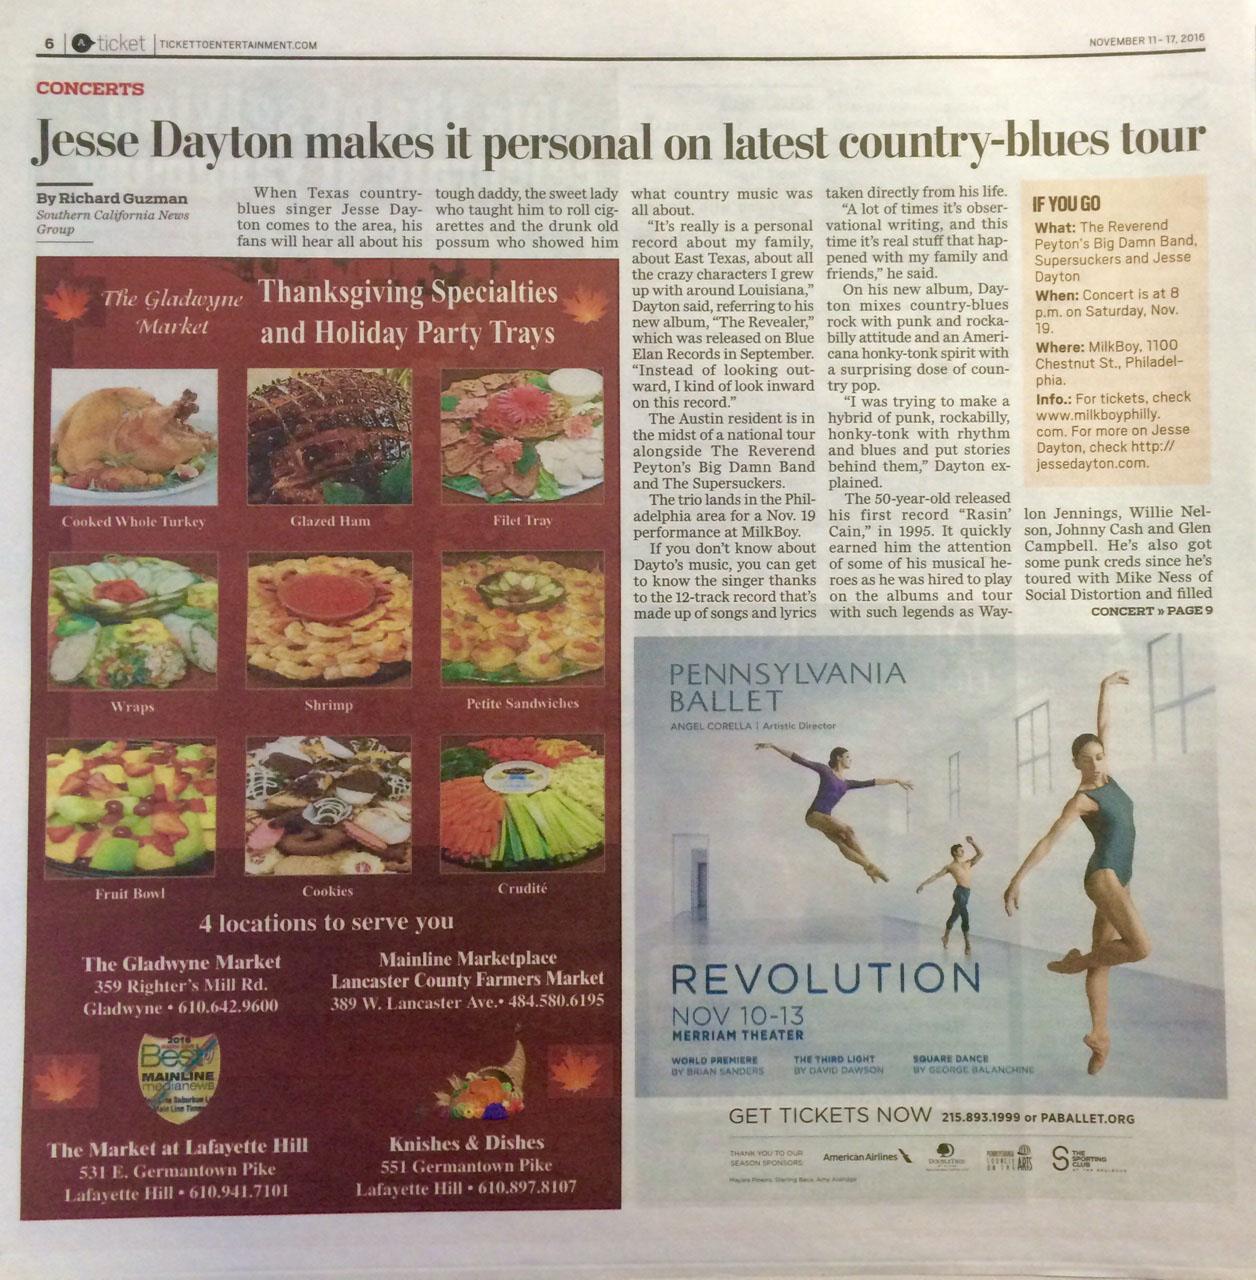 Print Ad in Main Line Media News